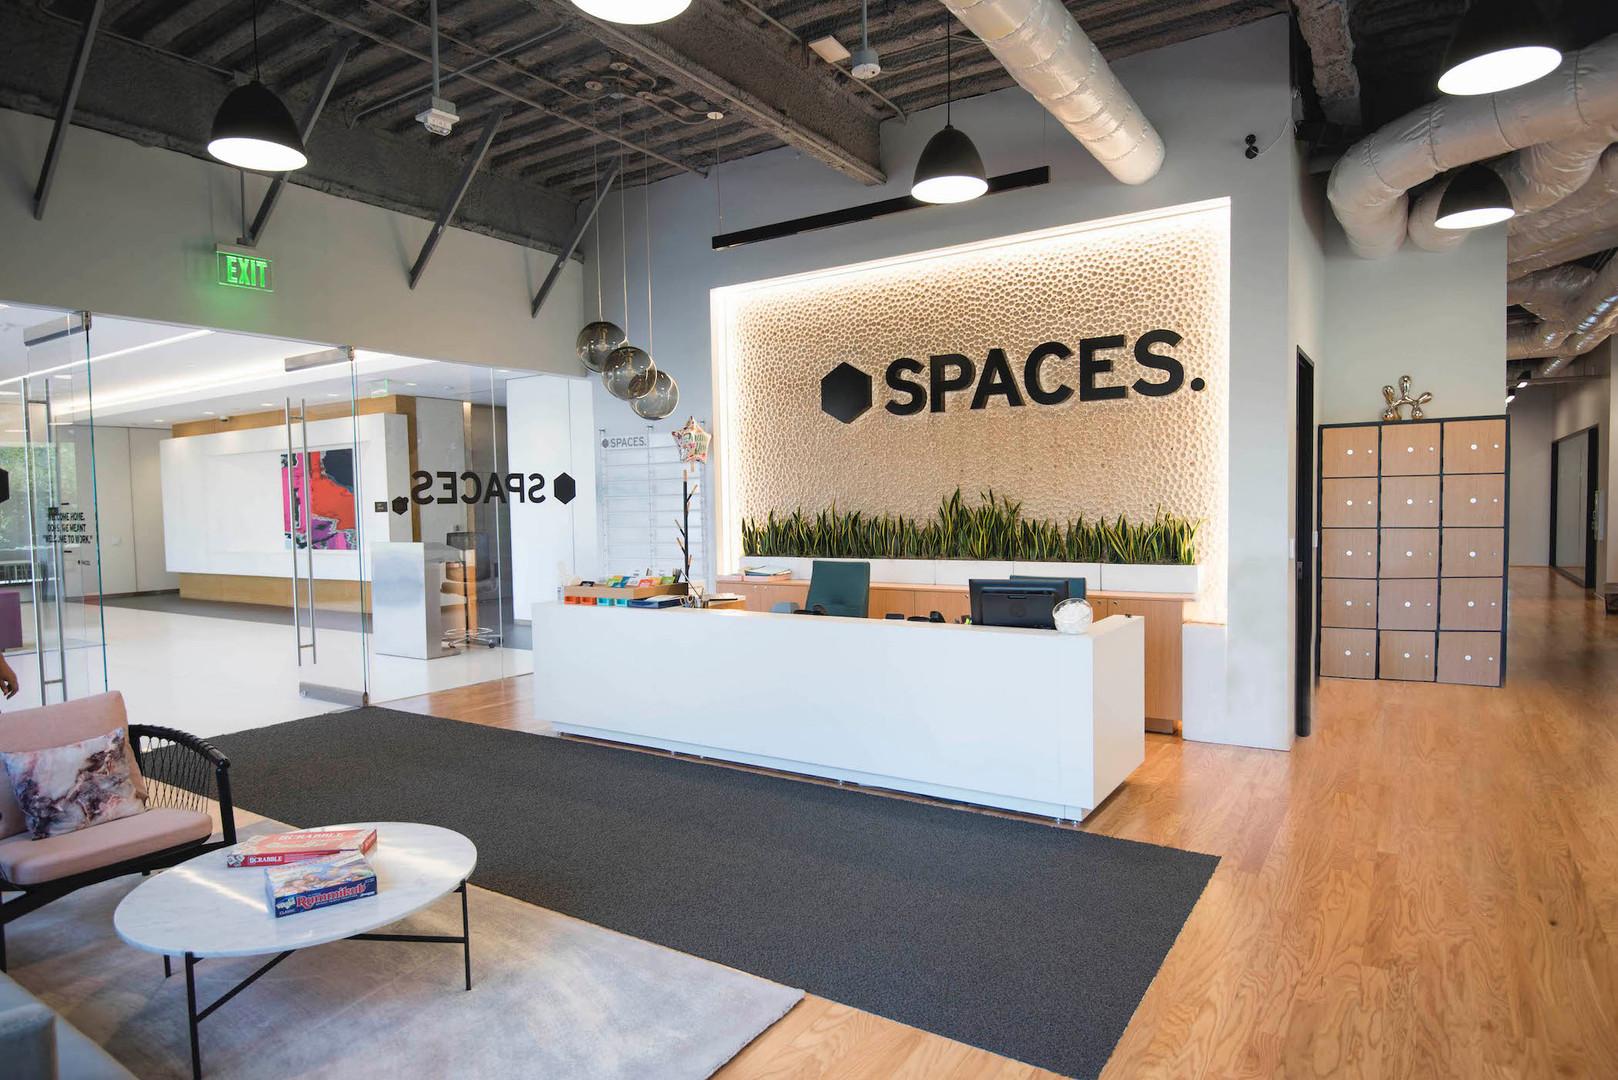 Spaces Costa Mesa lobby